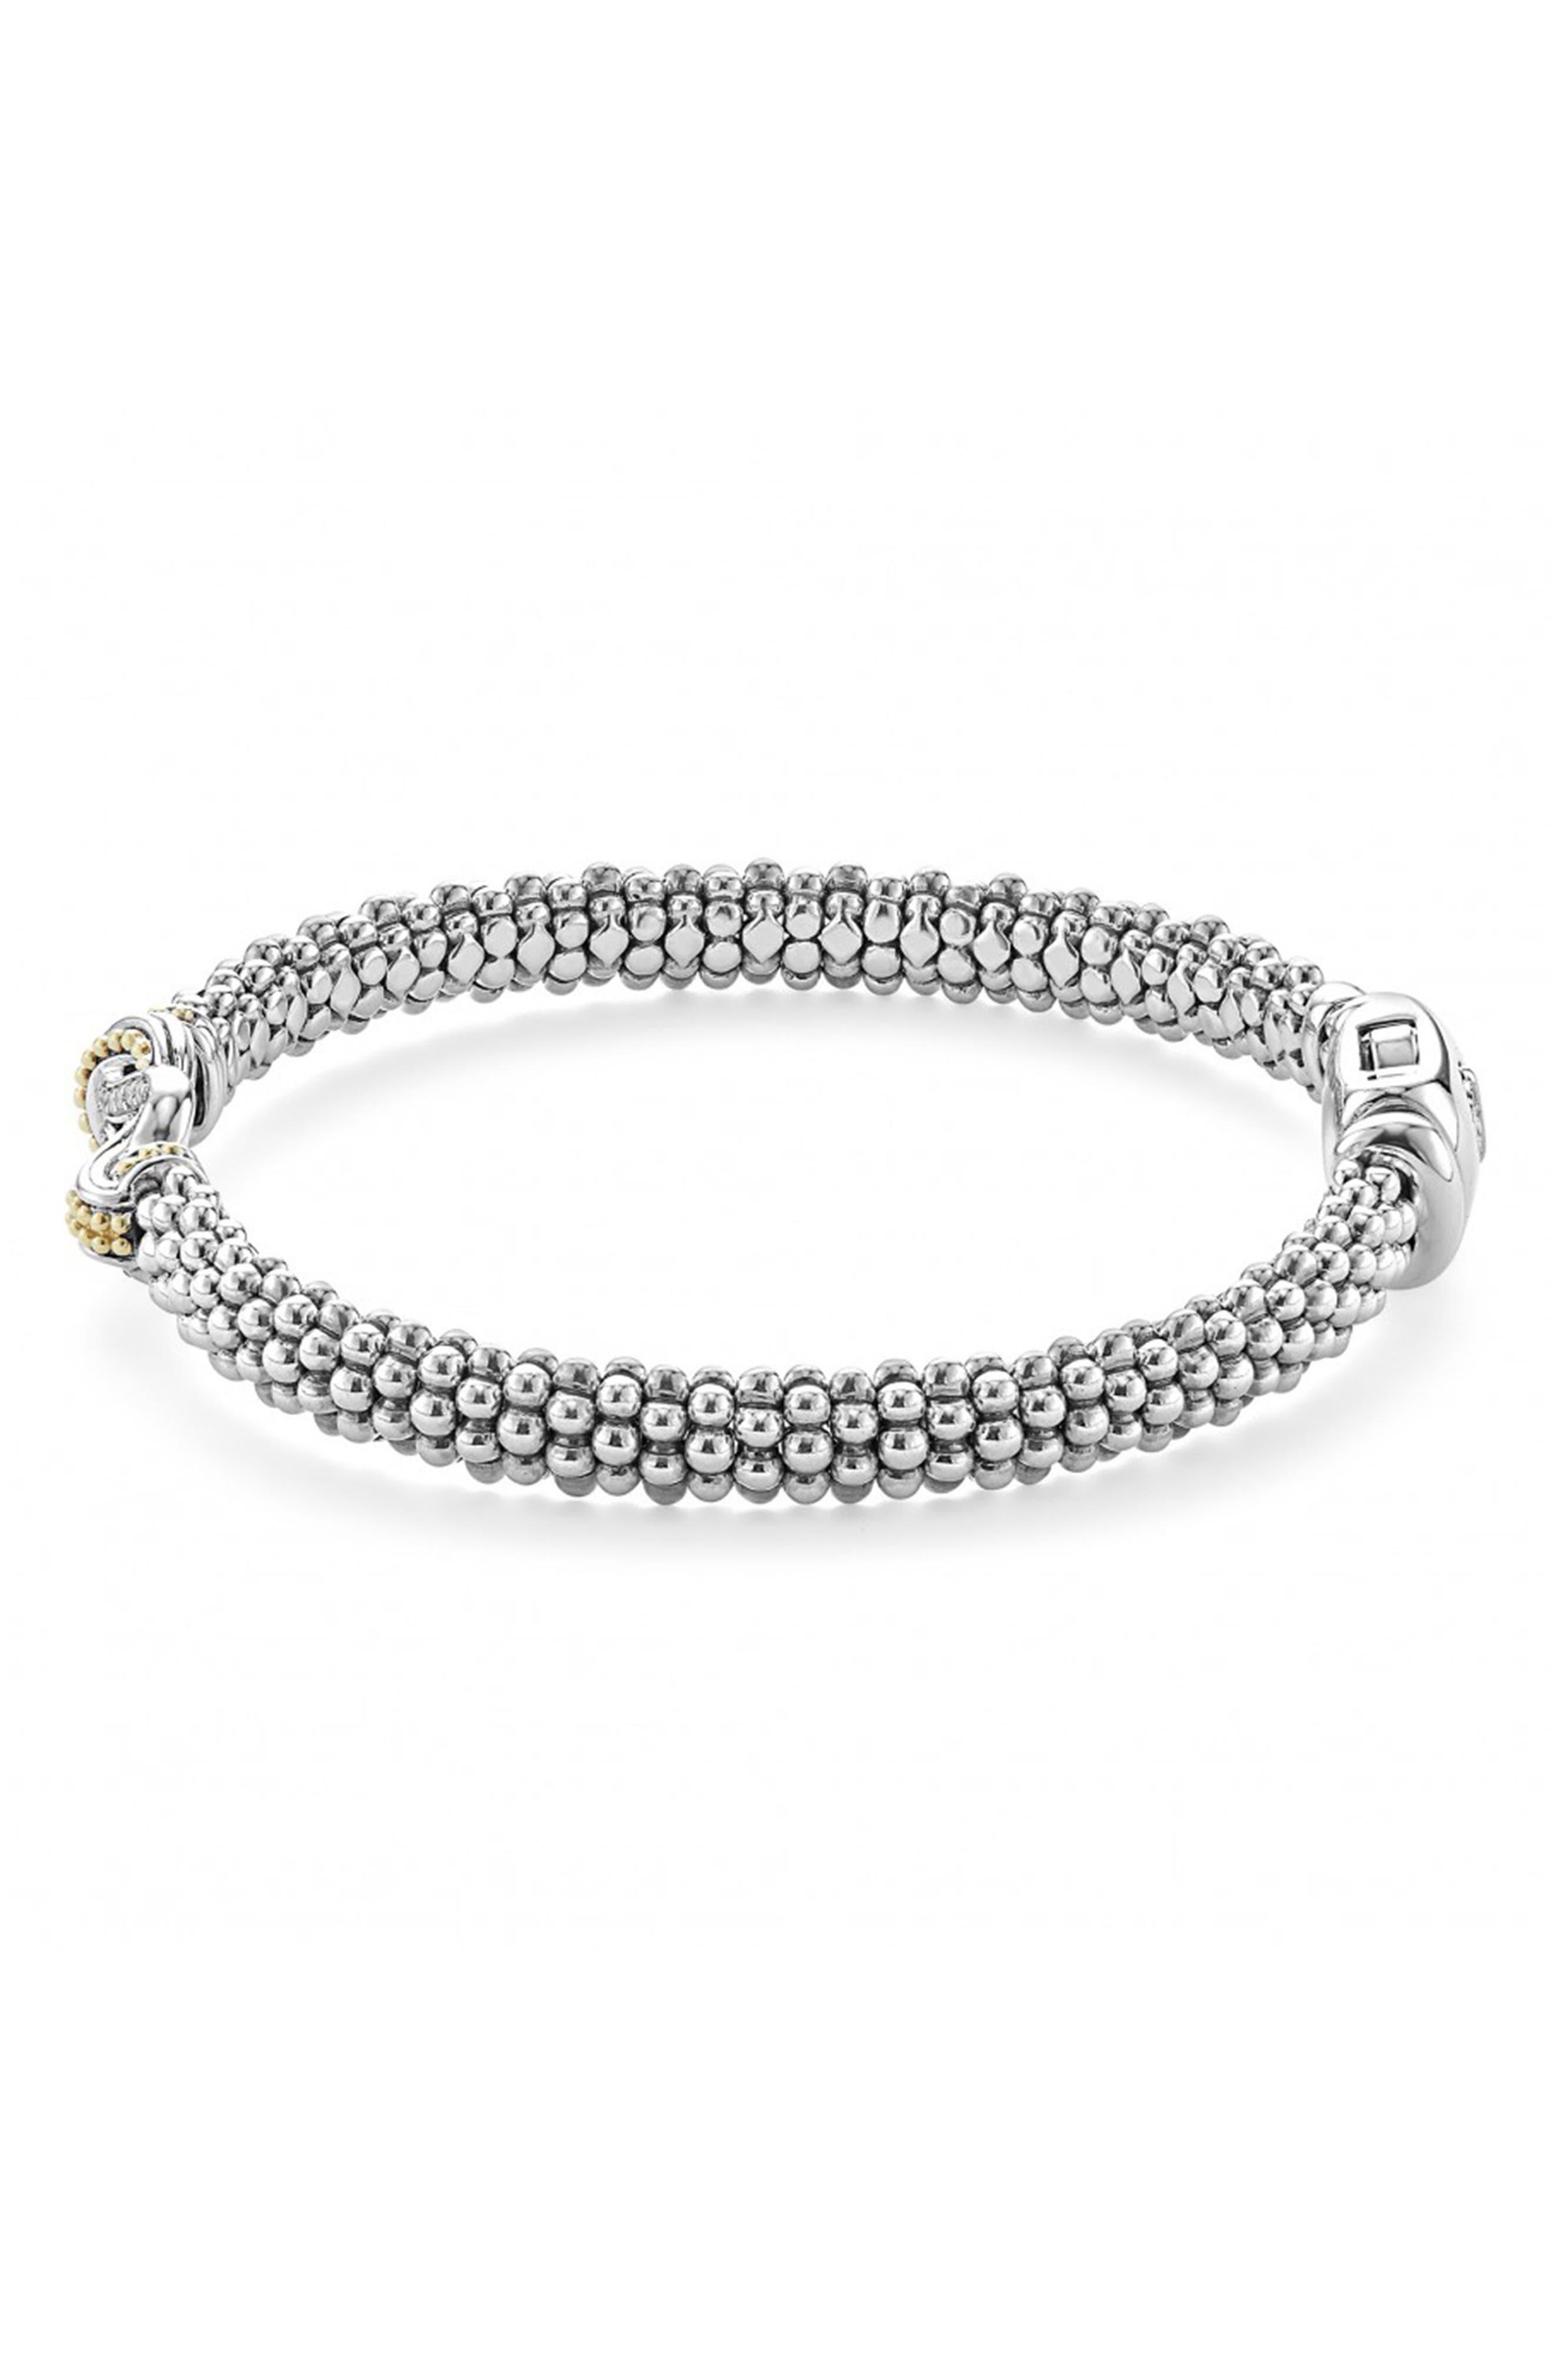 'Newport' Diamond Knot Bracelet,                             Alternate thumbnail 6, color,                             SILVER/ GOLD